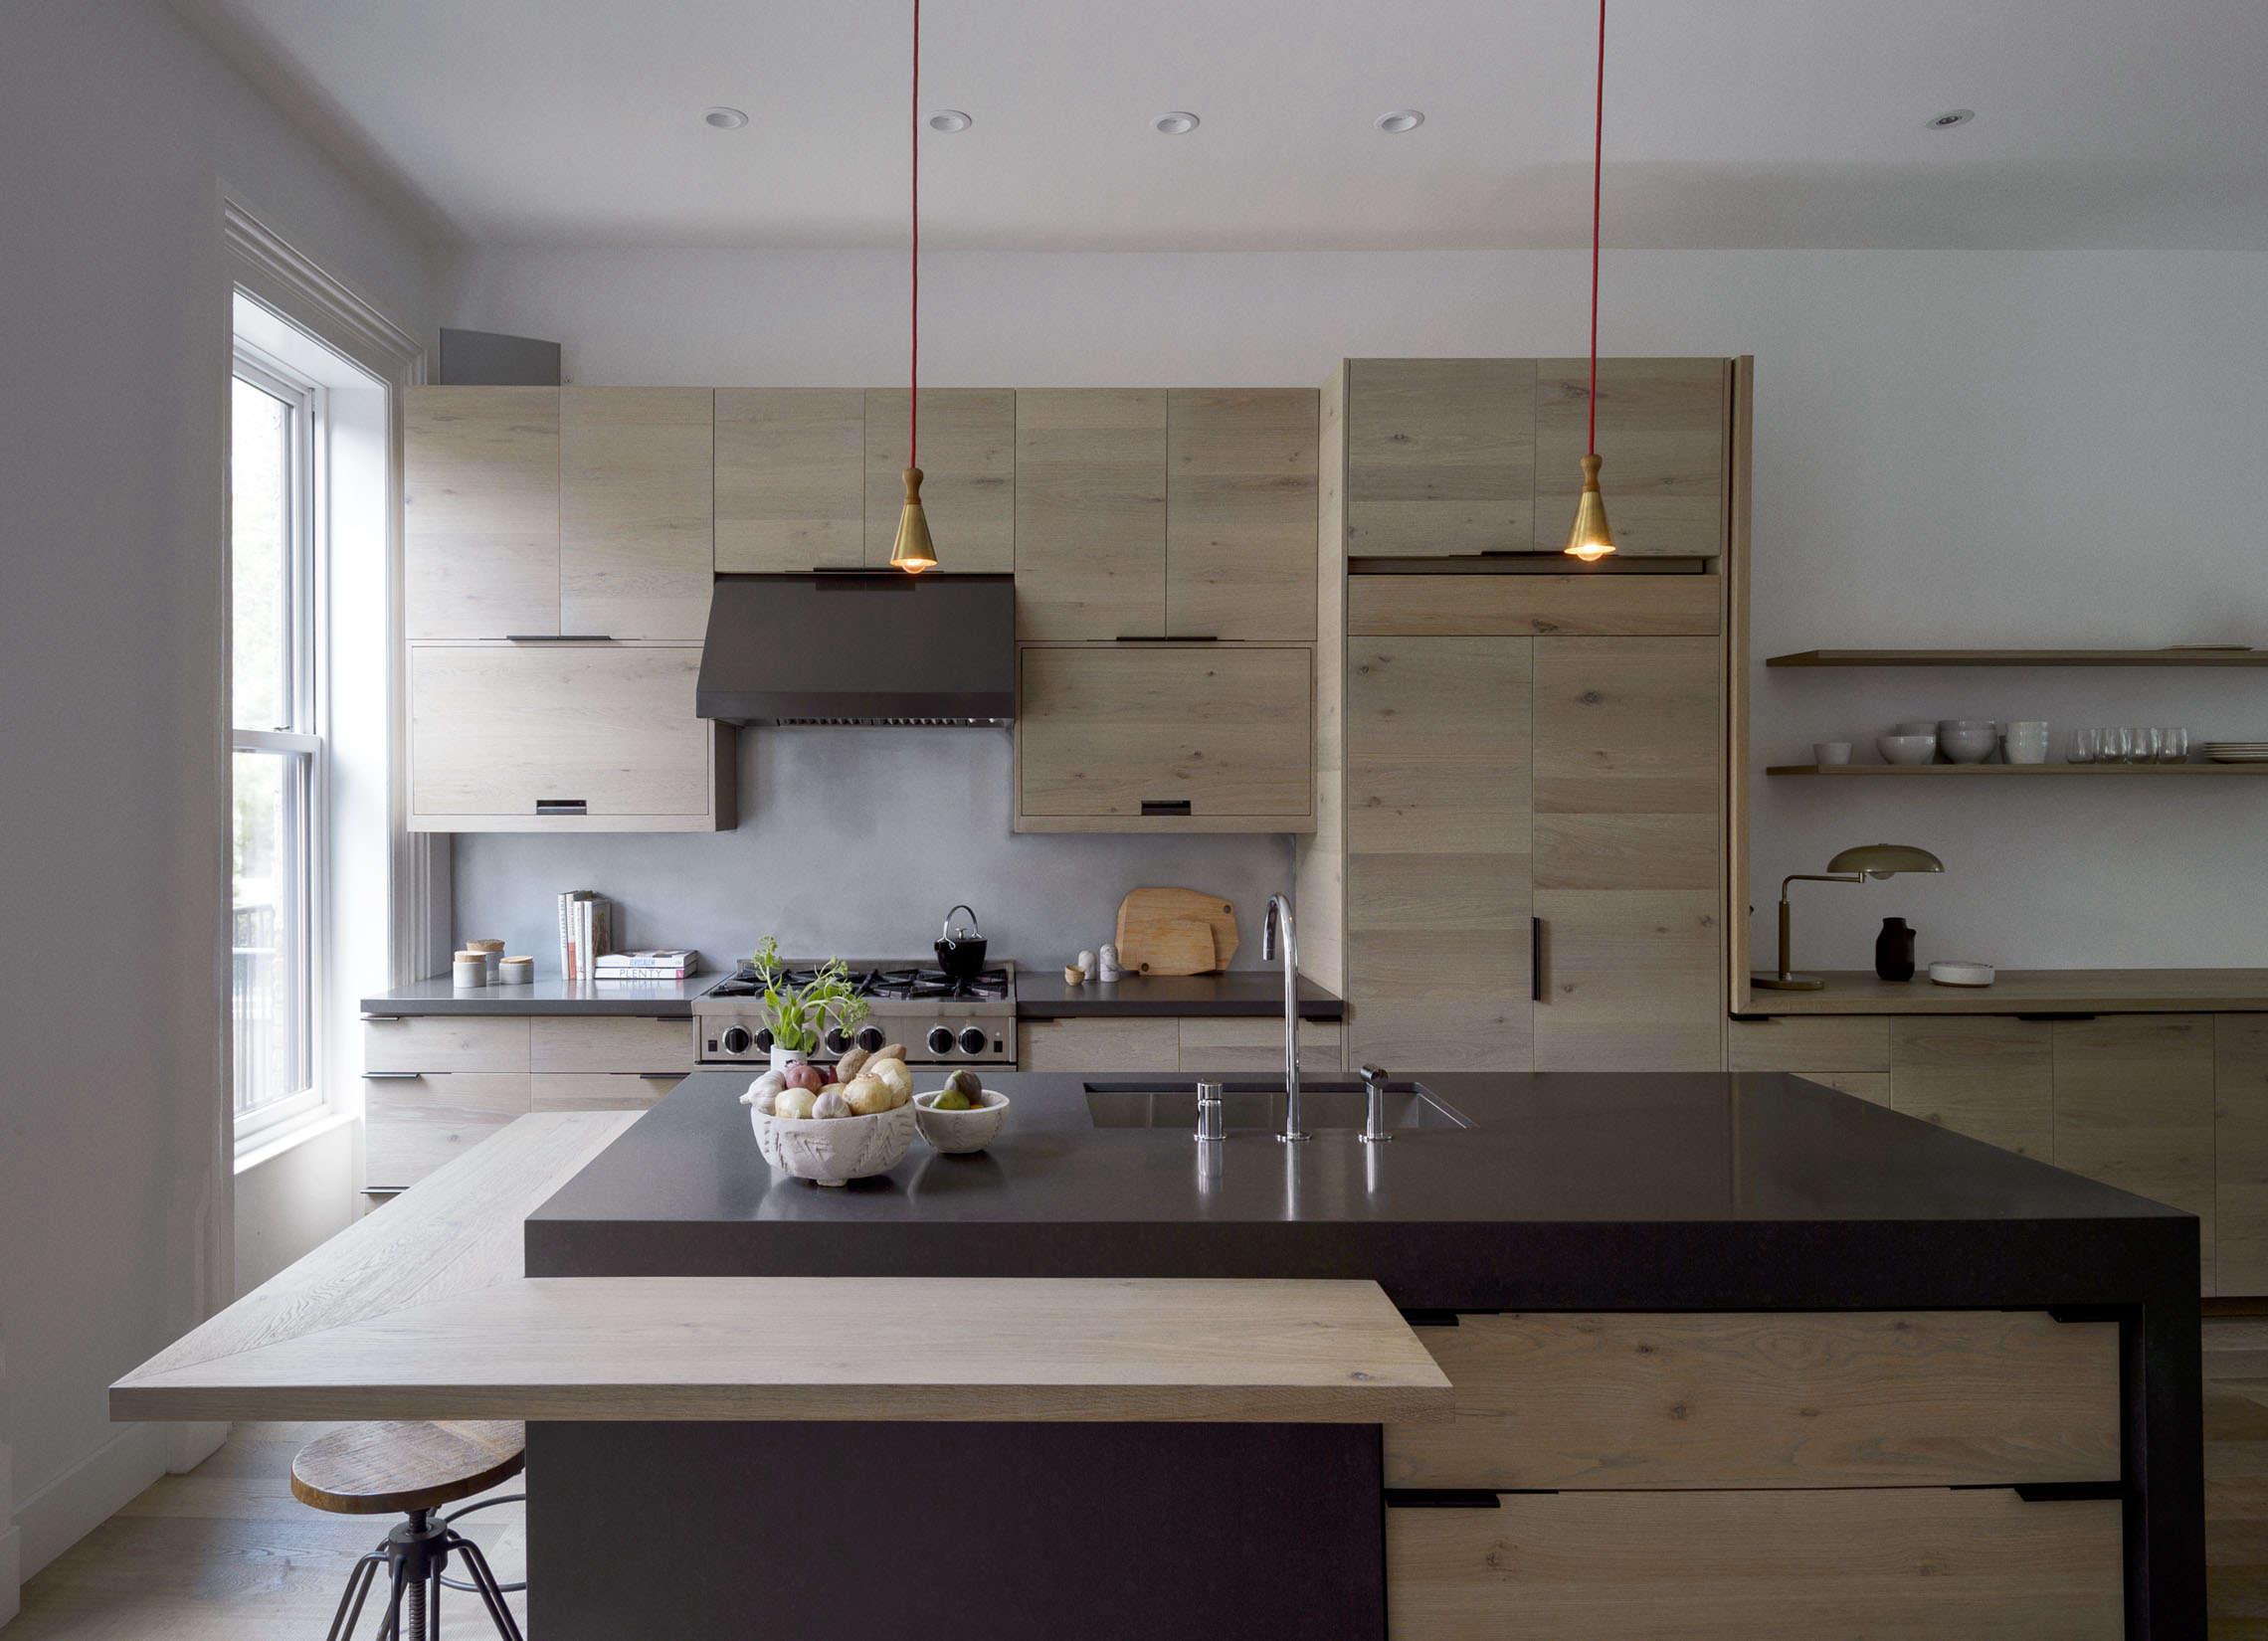 brooklyn kitchen design with custom wood cabinets by workstead, matthew william 9